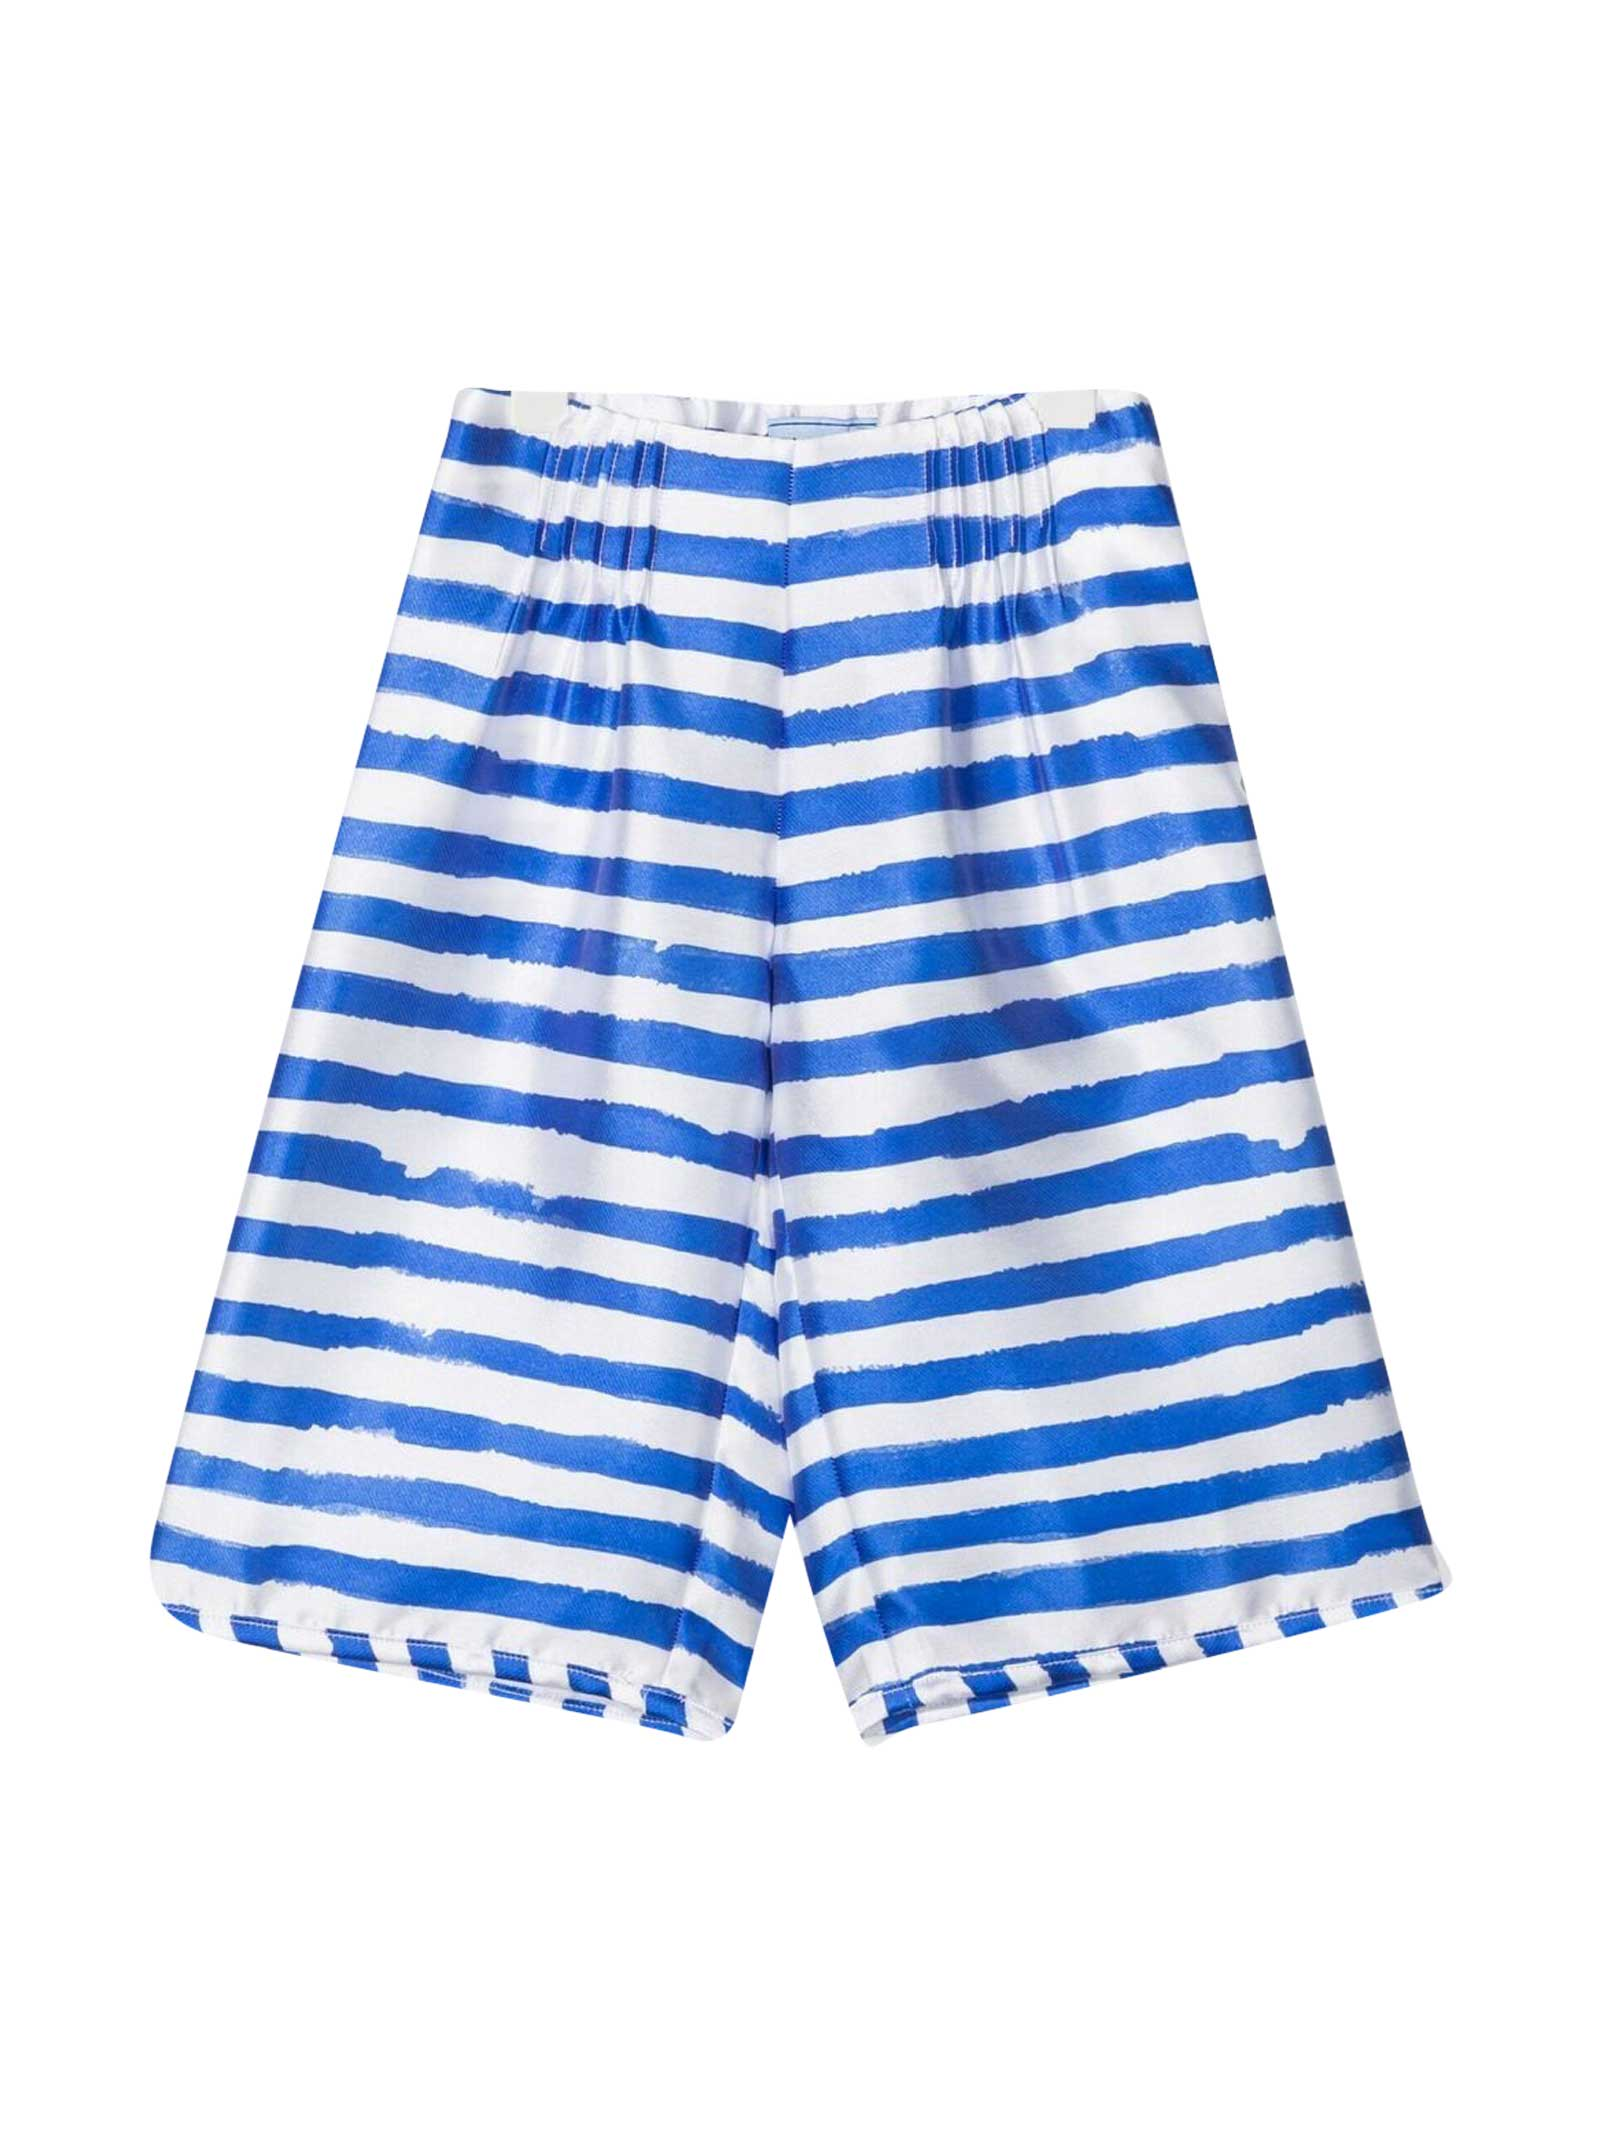 White Shorts With Blue Stripes Mi Mi Sol Kids